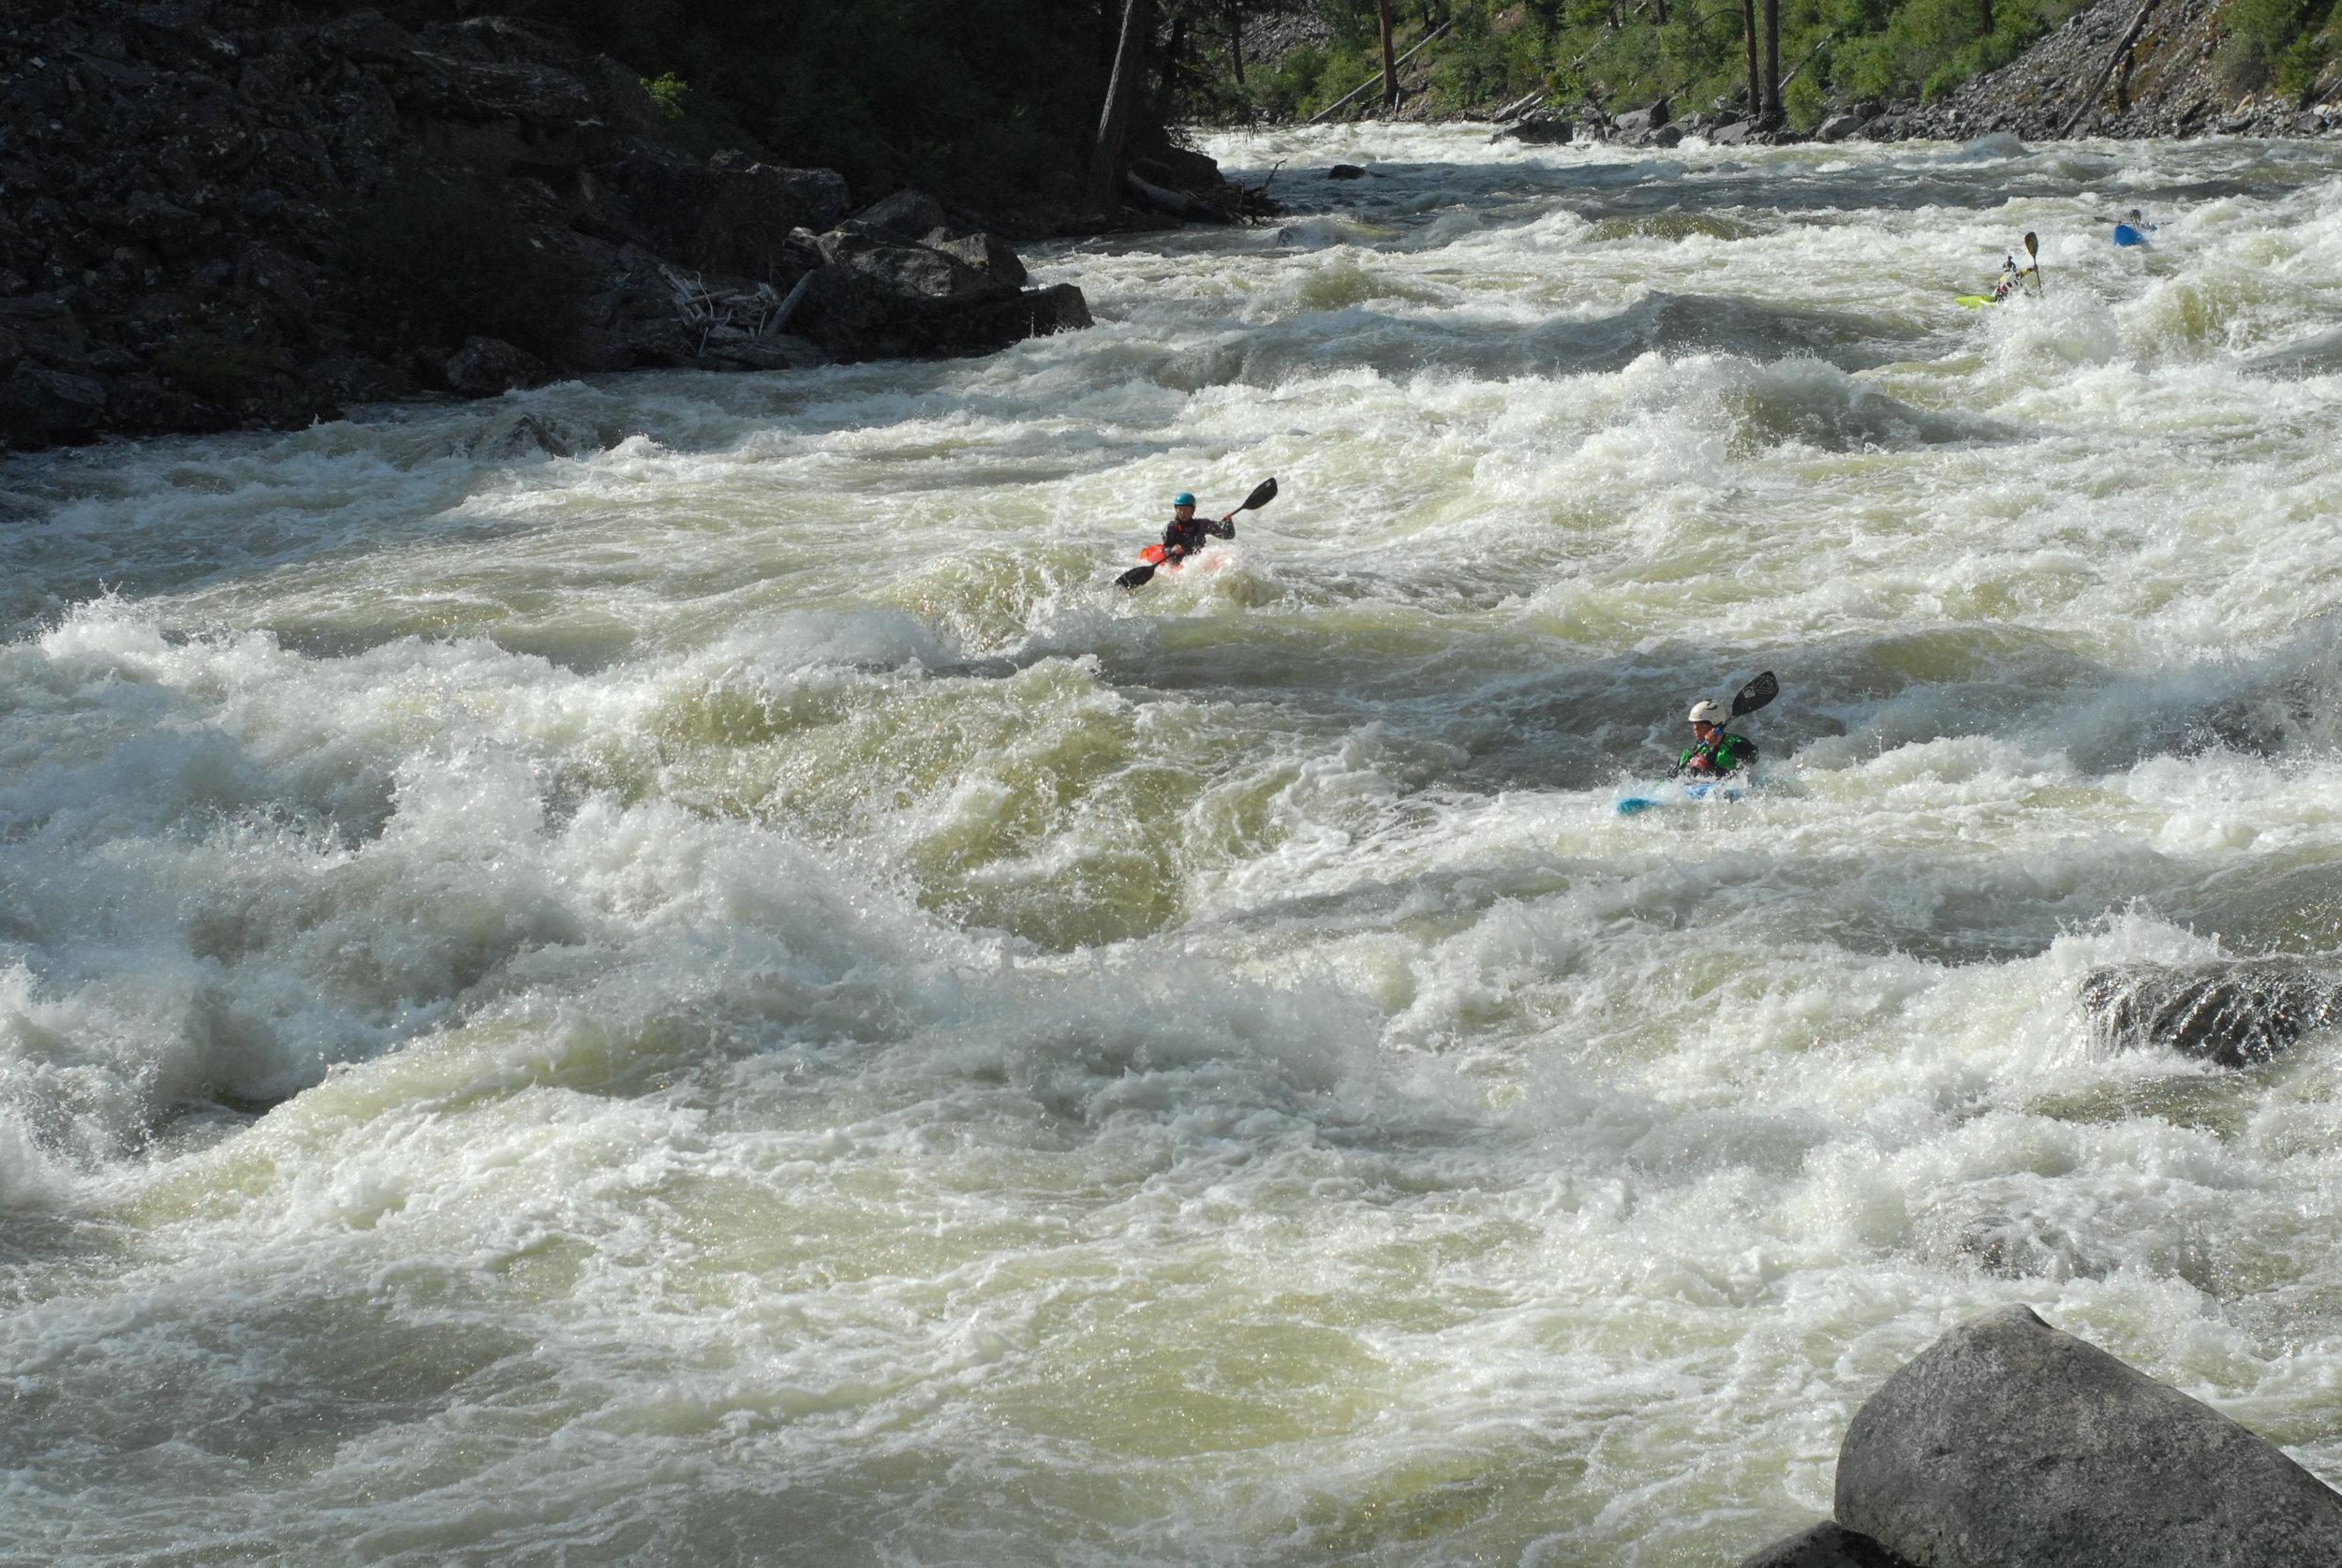 whitewater of the South Fork Salmon river idaho kayaking .JPG